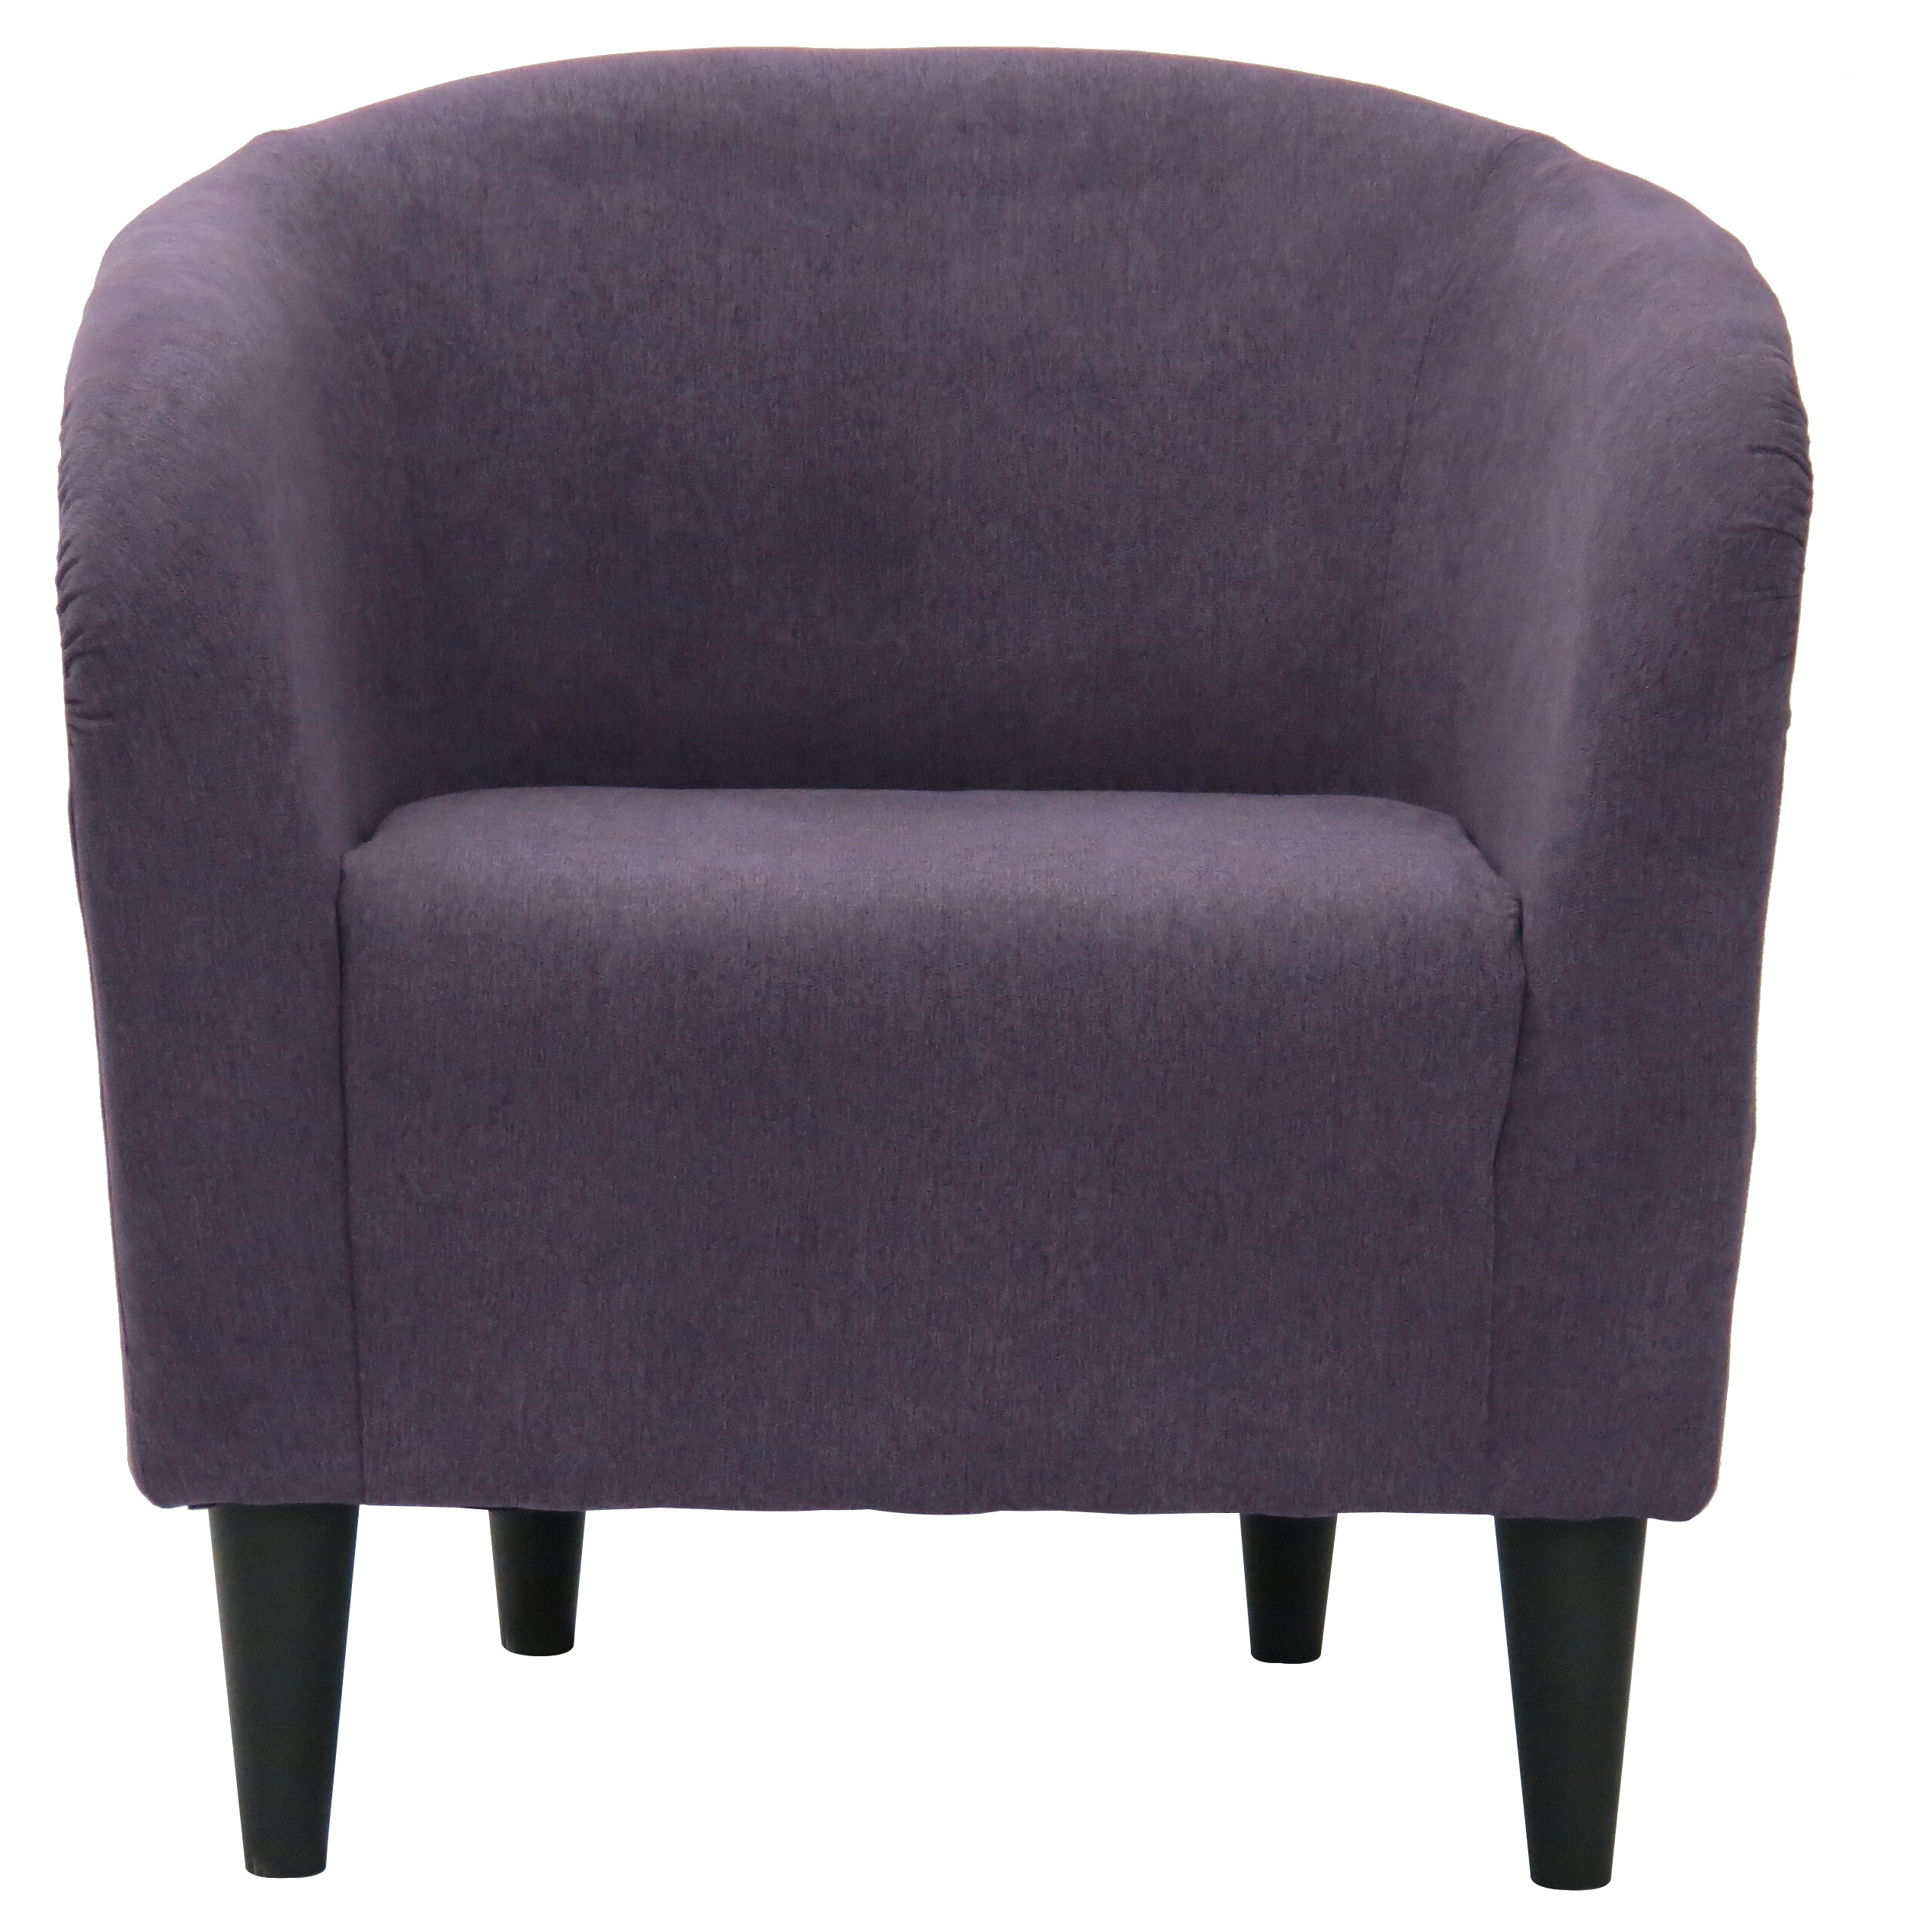 Willa Arlo Interiors Hana Barrel Chair For Preferred Ziaa Barrel Chairs (View 19 of 20)